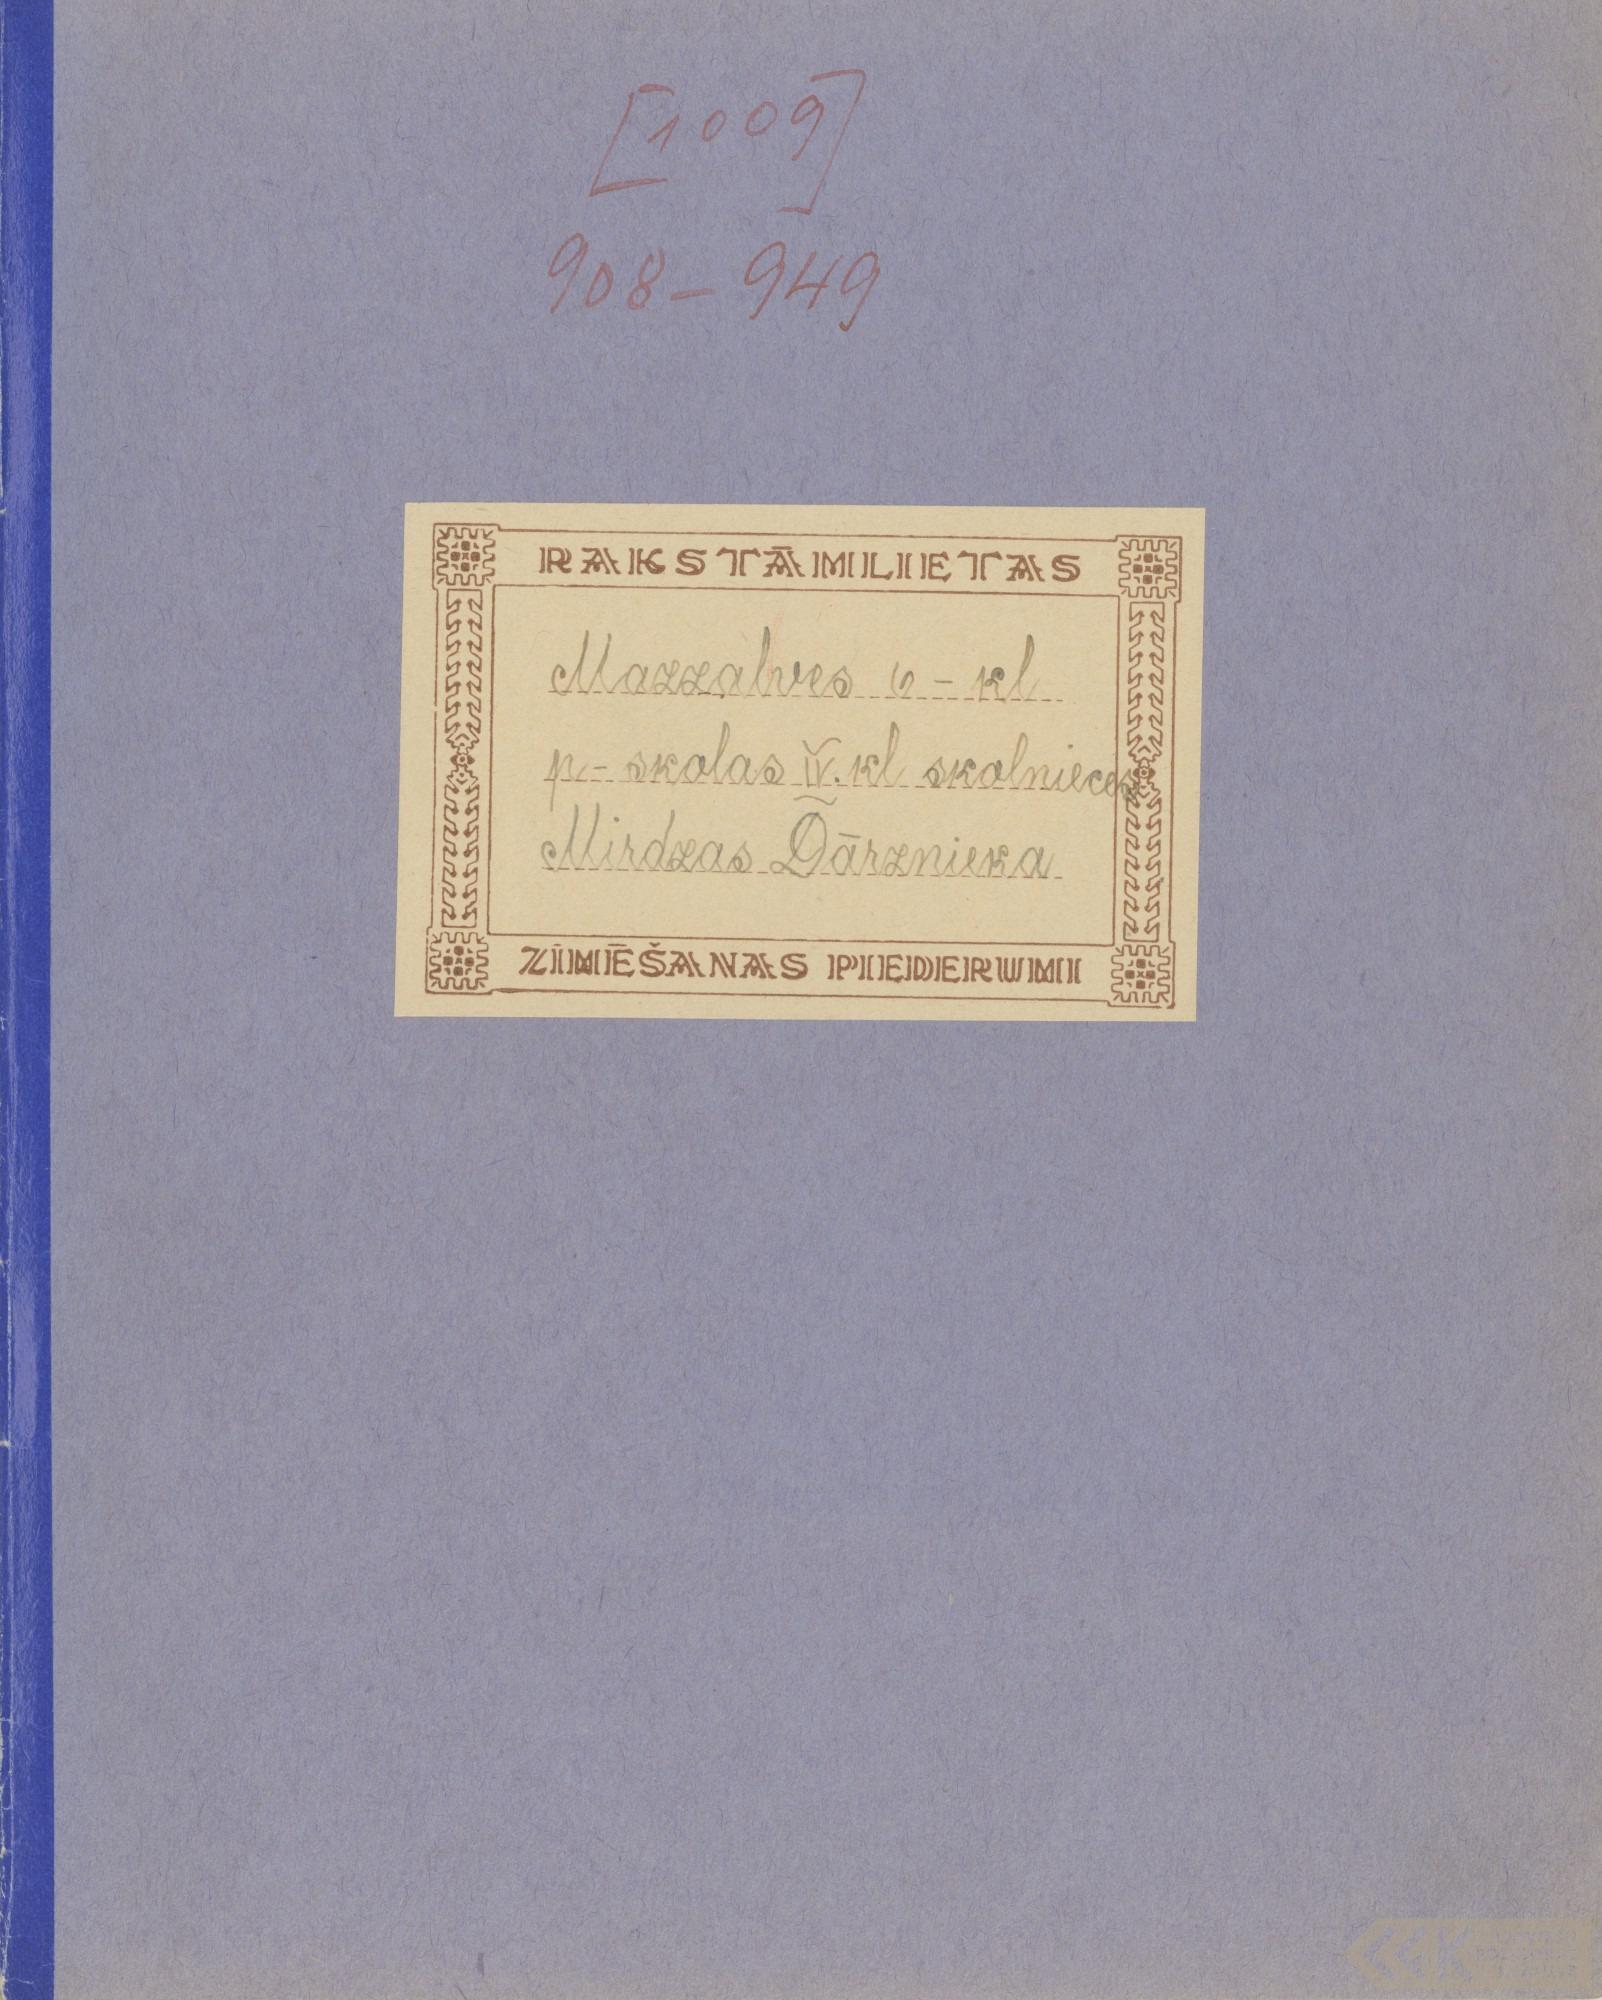 1009-Mazzalves-pamatskola-02-0008